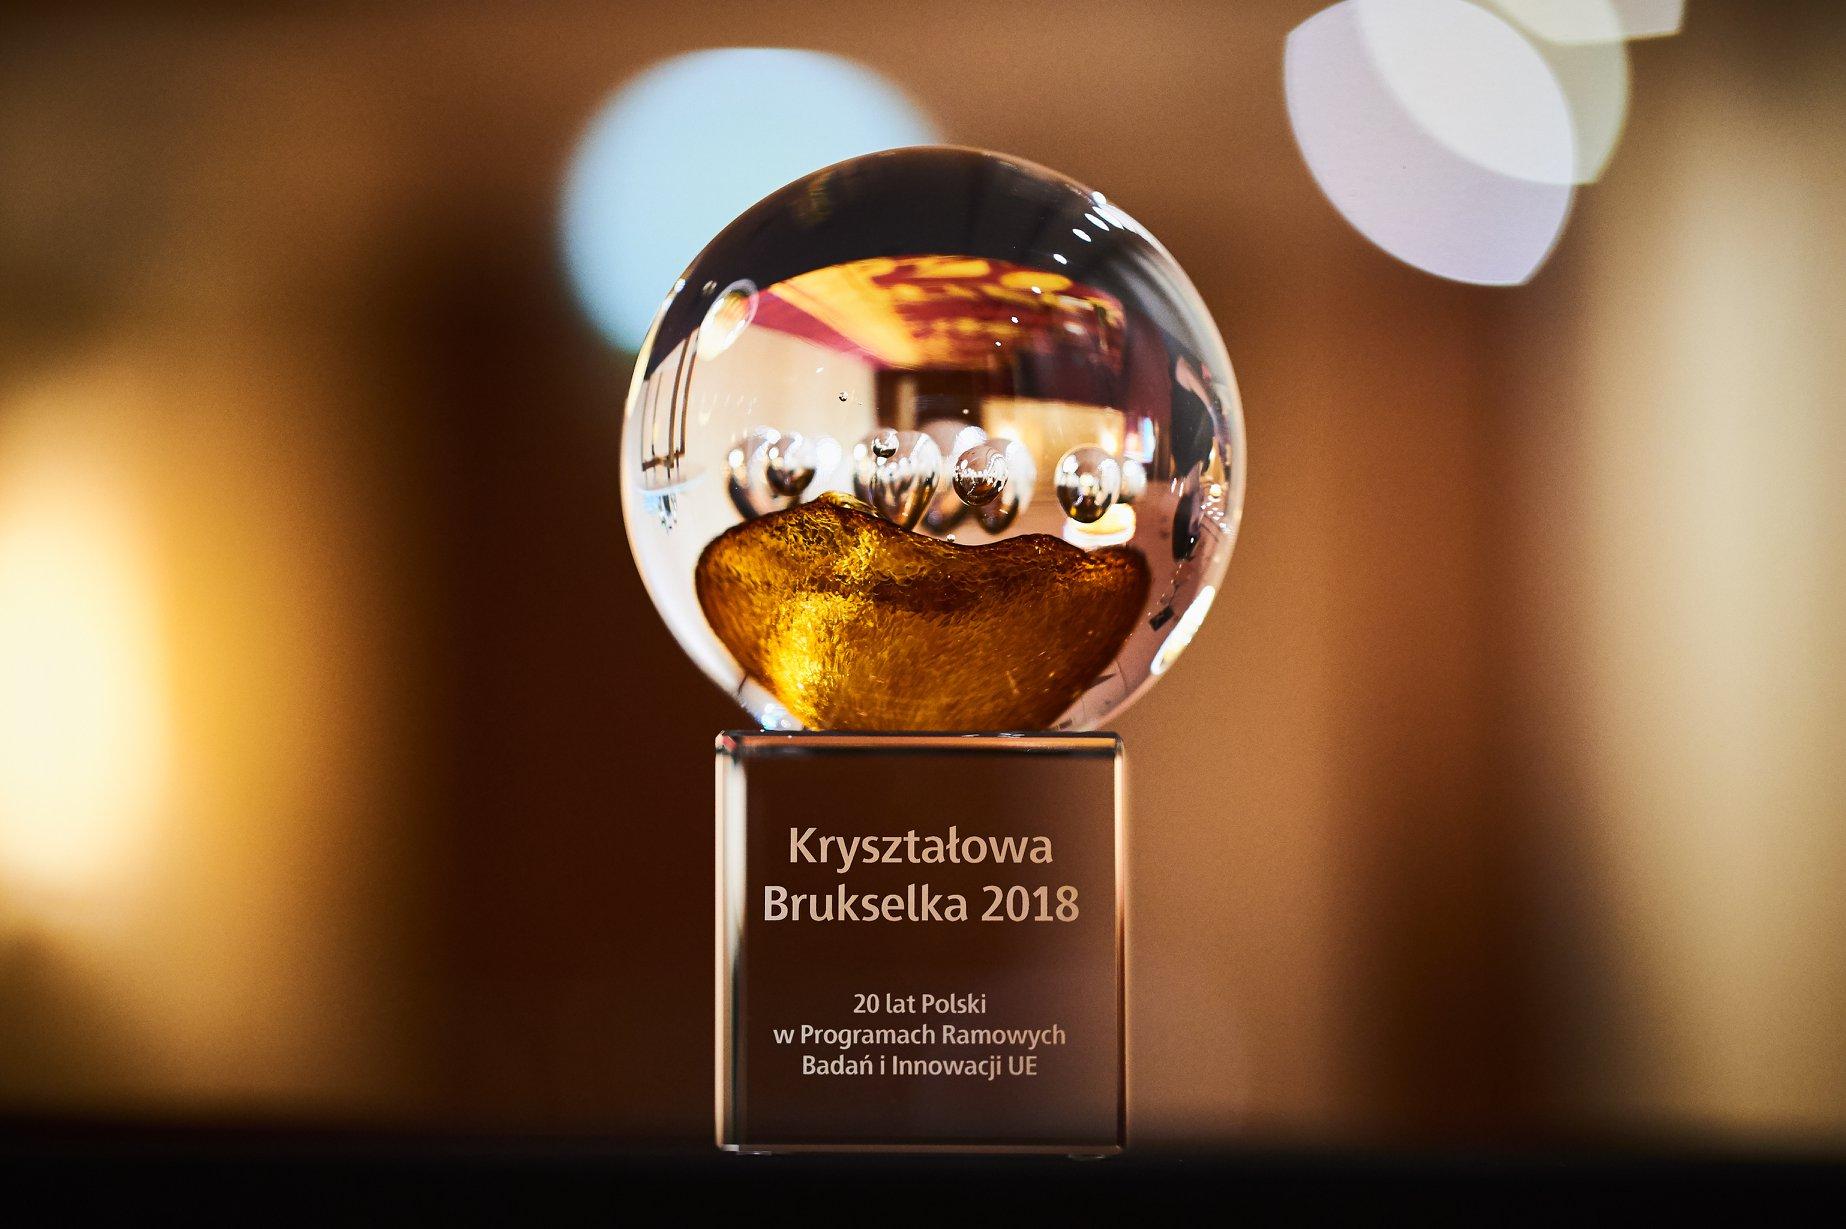 KrysztalowaBrukselka2018-Statuetka-zrodlo-KPK-foto-RobertGraff